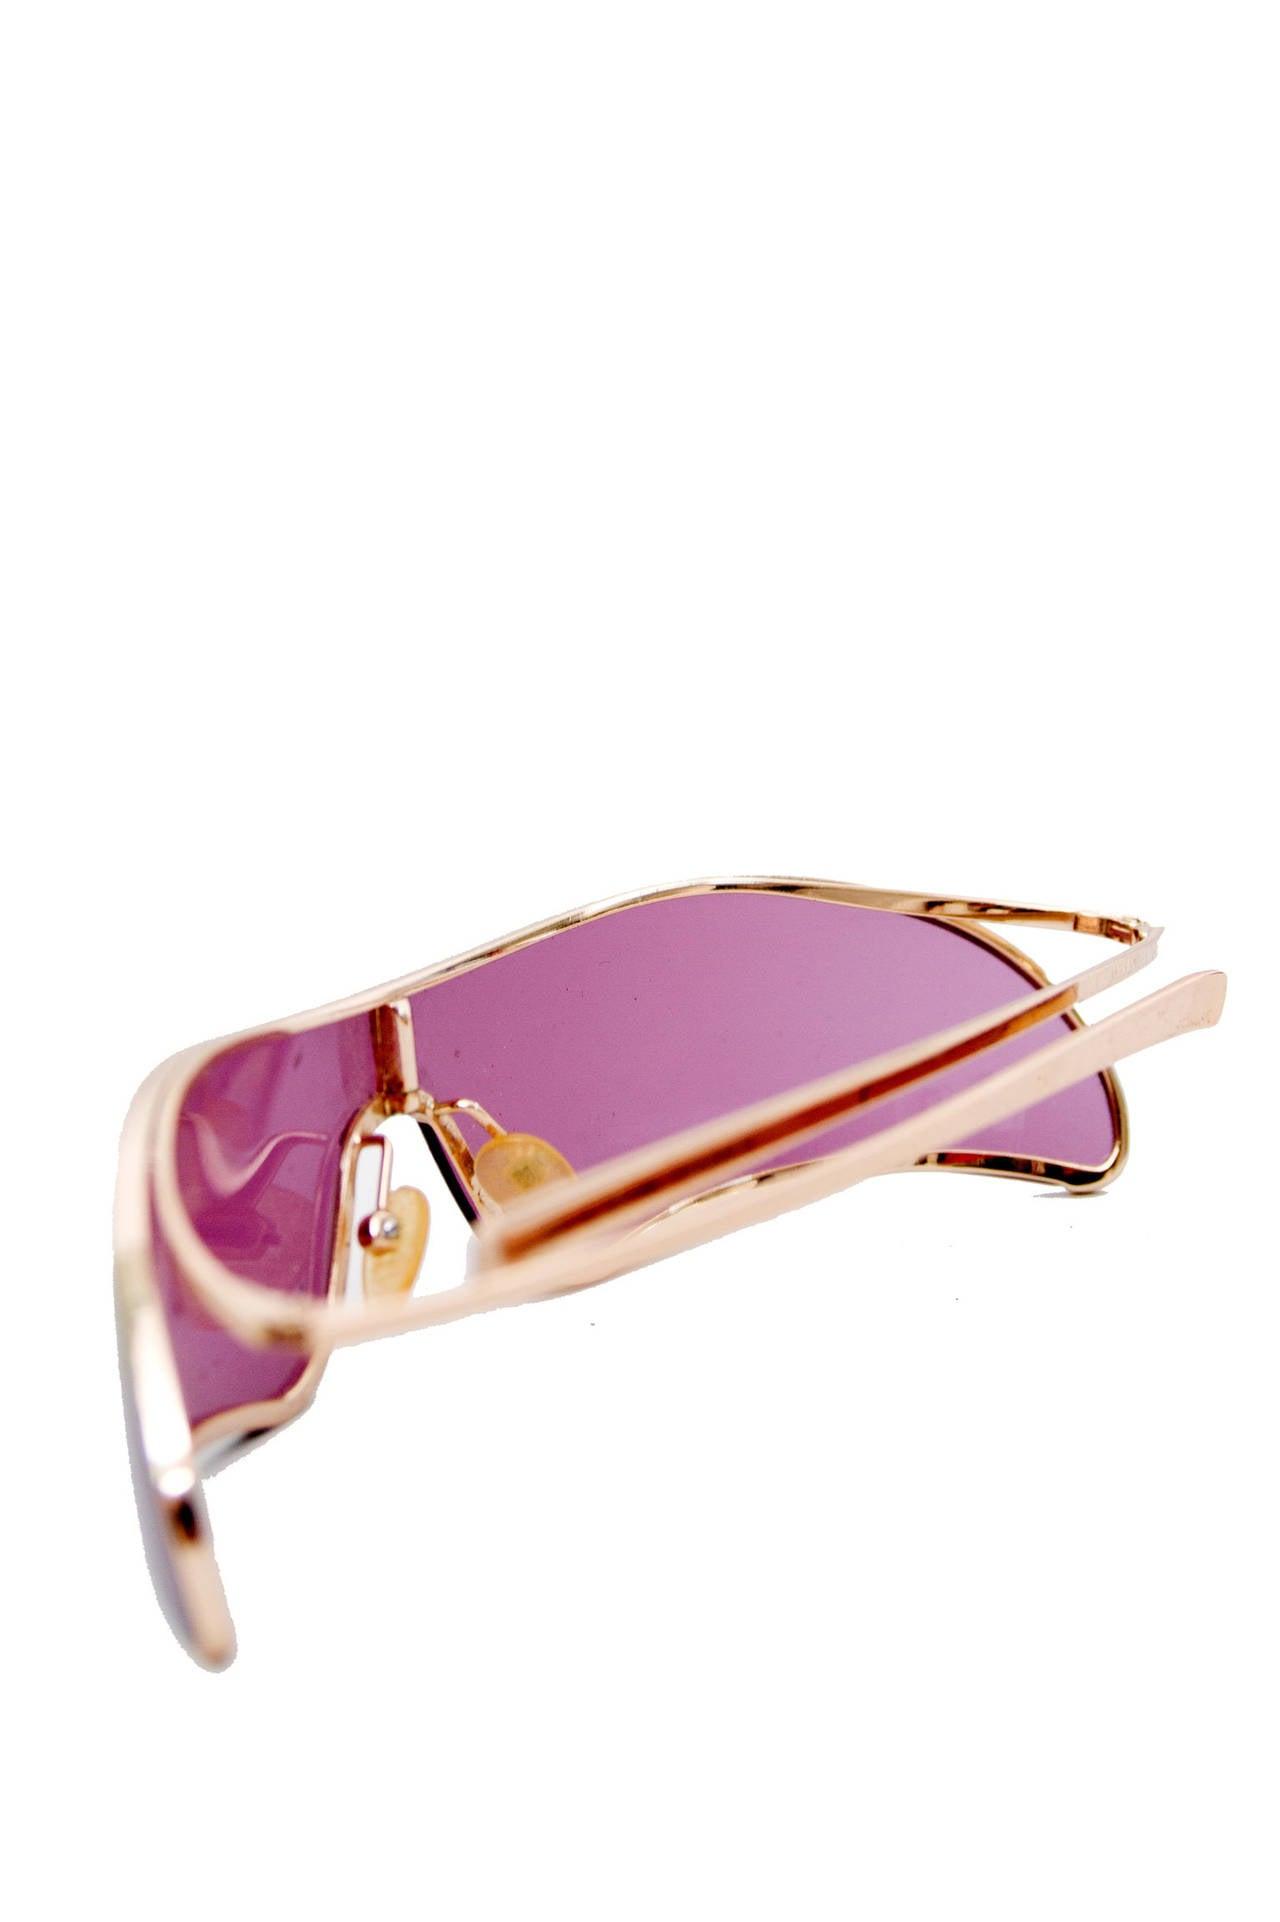 Rare Alexander McQueen Sunglasses In Good Condition For Sale In Copenhagen, DK